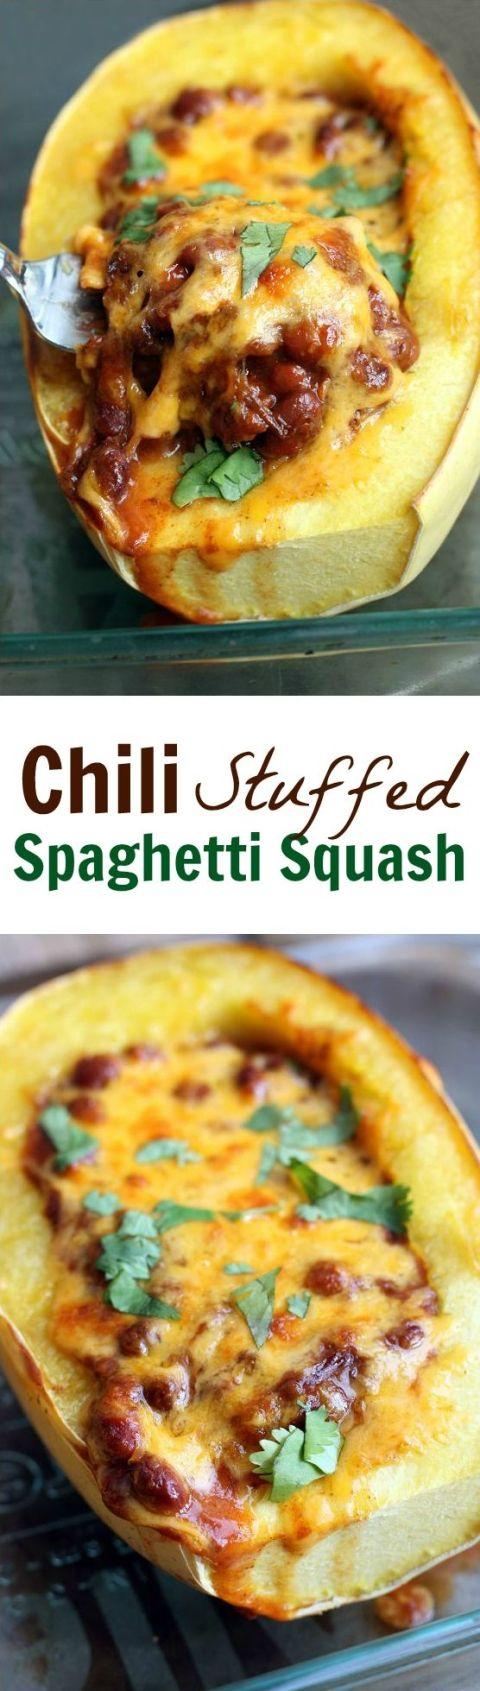 spaghetti squash chili spaghetti squash soup recipes spaghetti squash ...